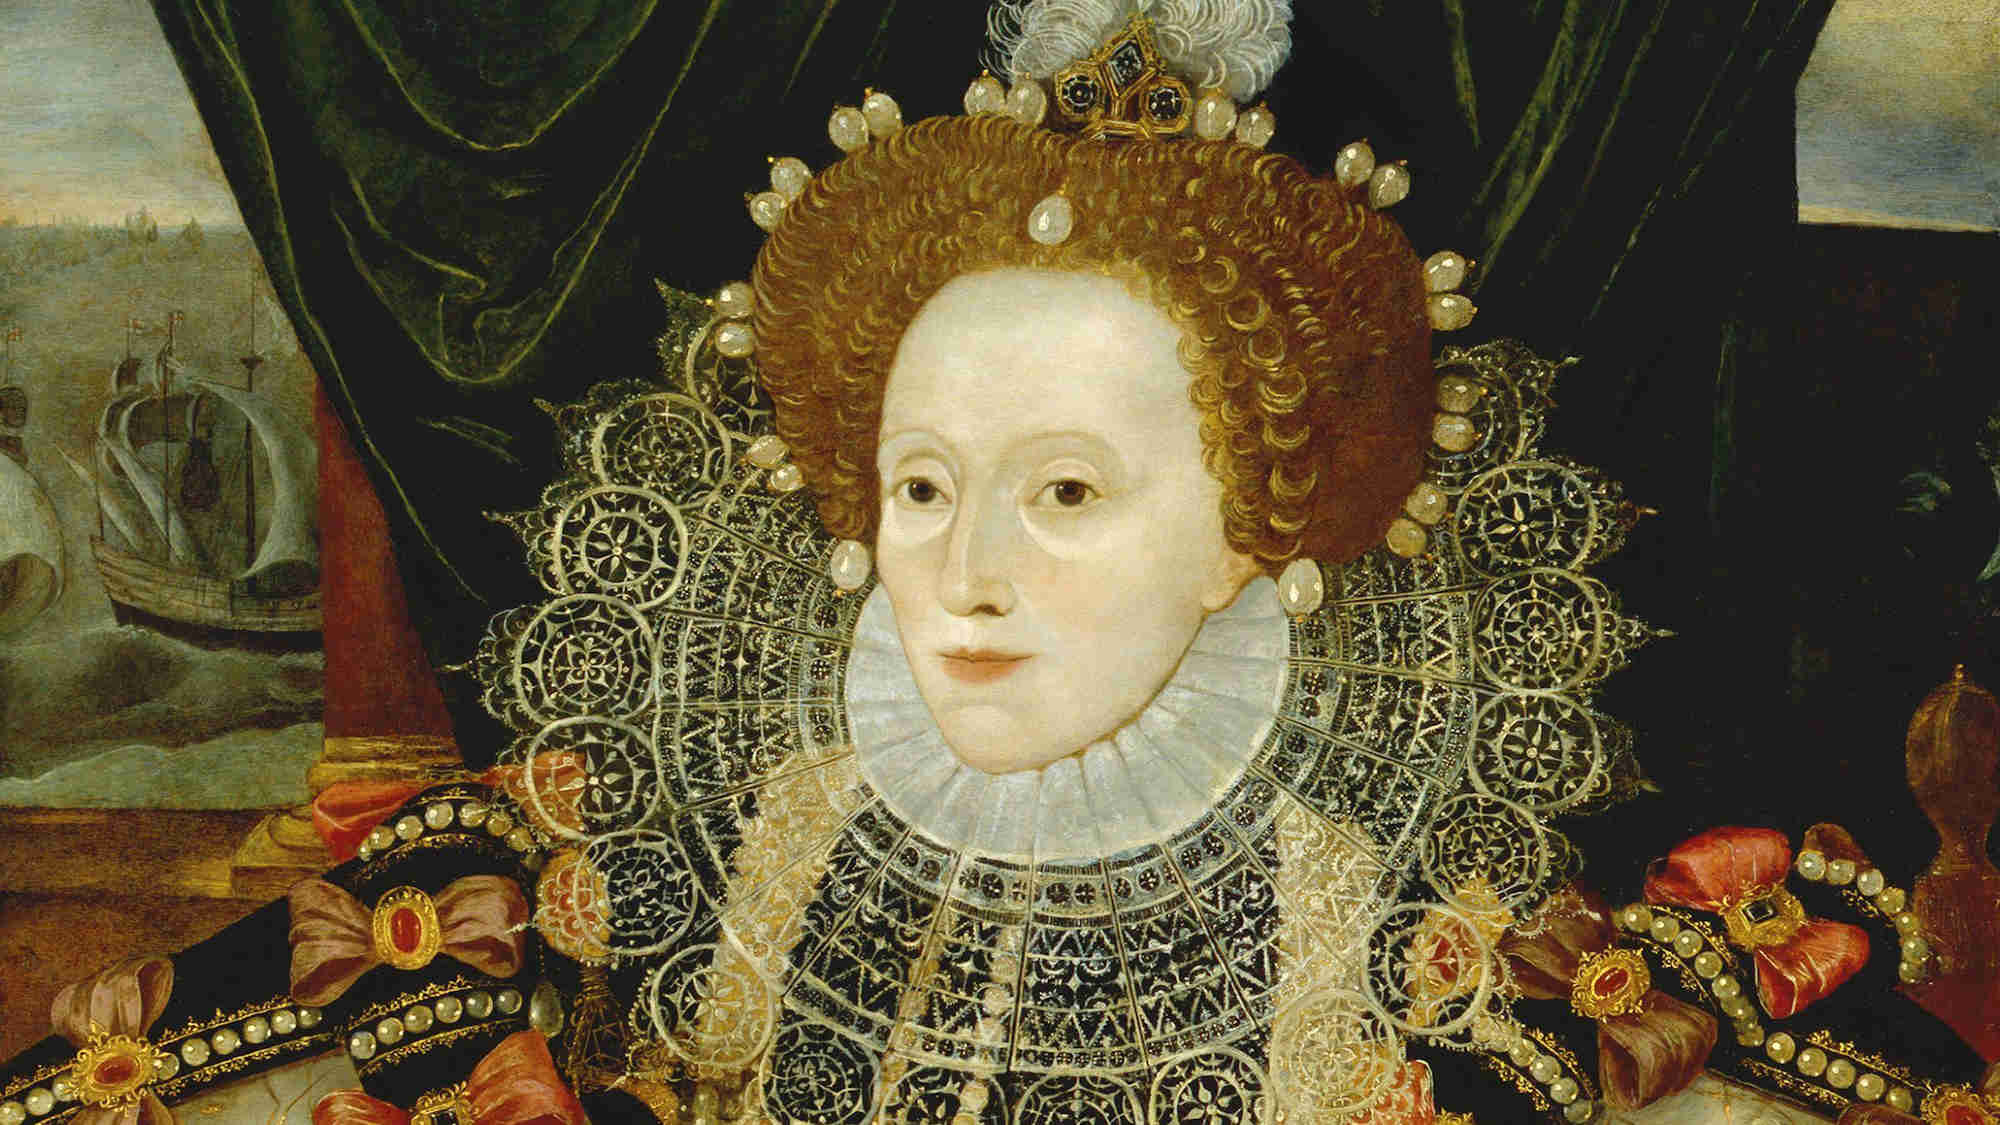 The Armada Portrait - Queen's House Greenwich